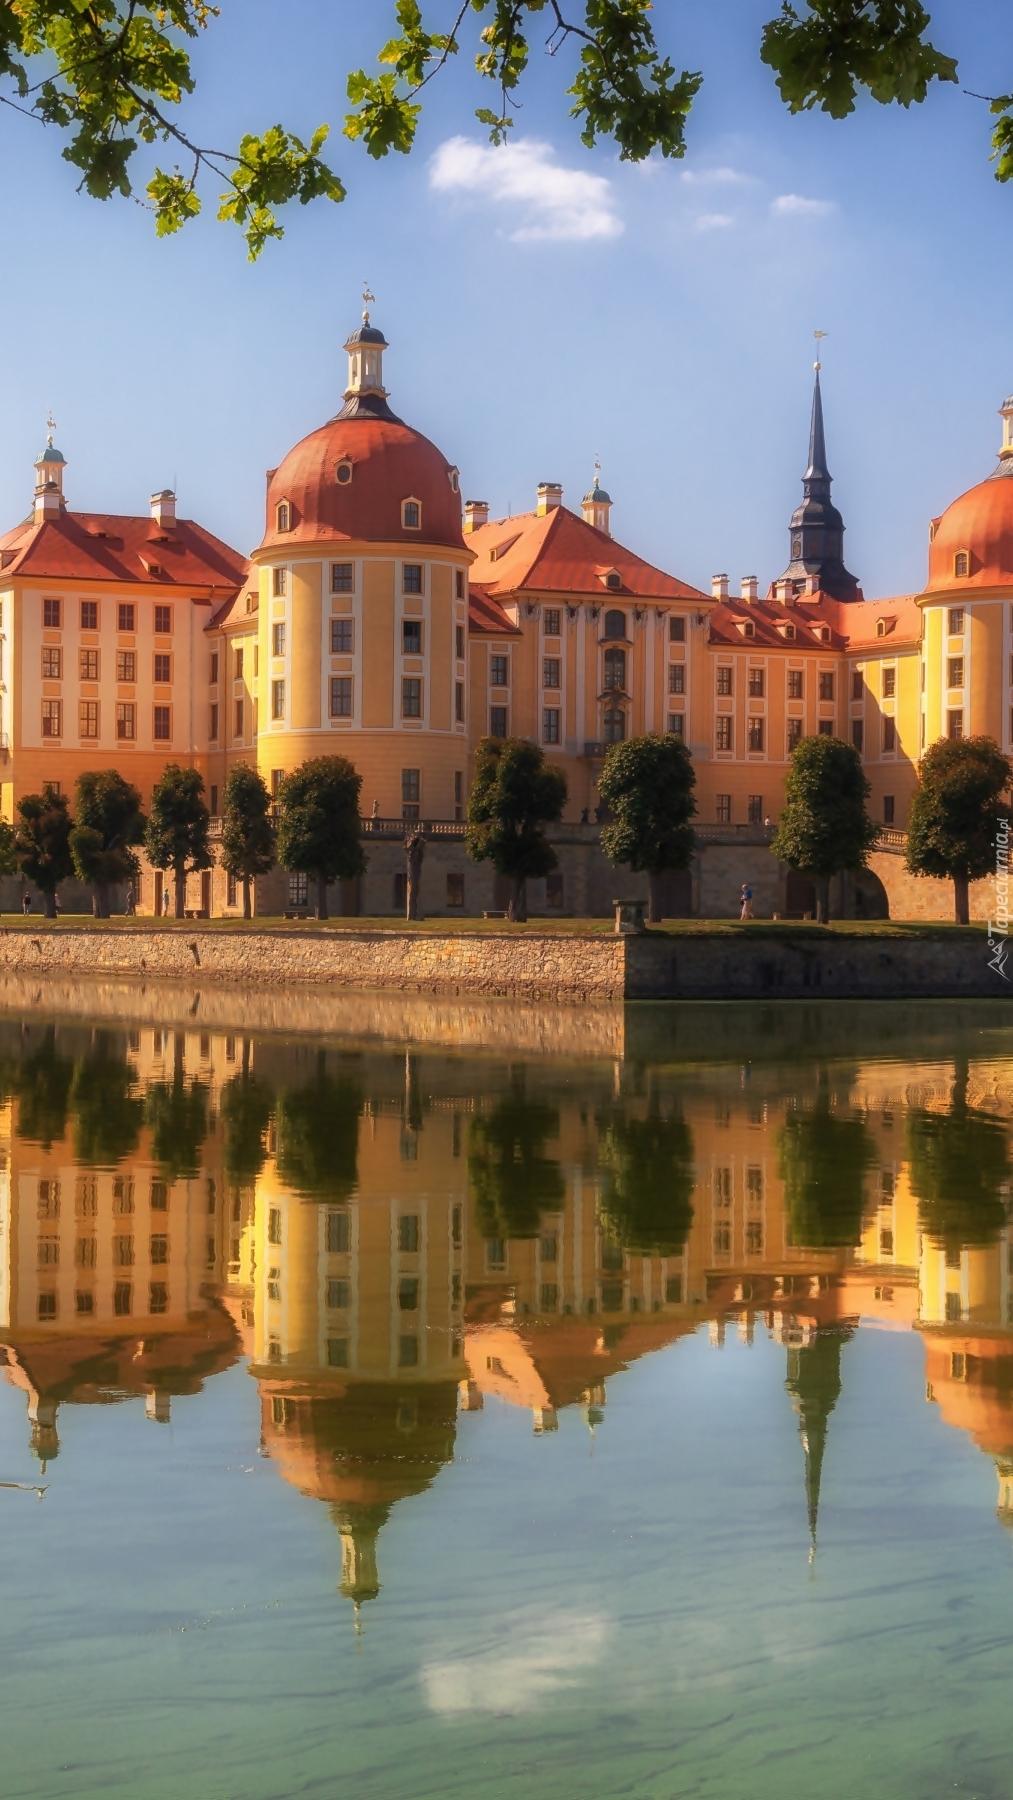 Pałac Moritzburg w Saksonii